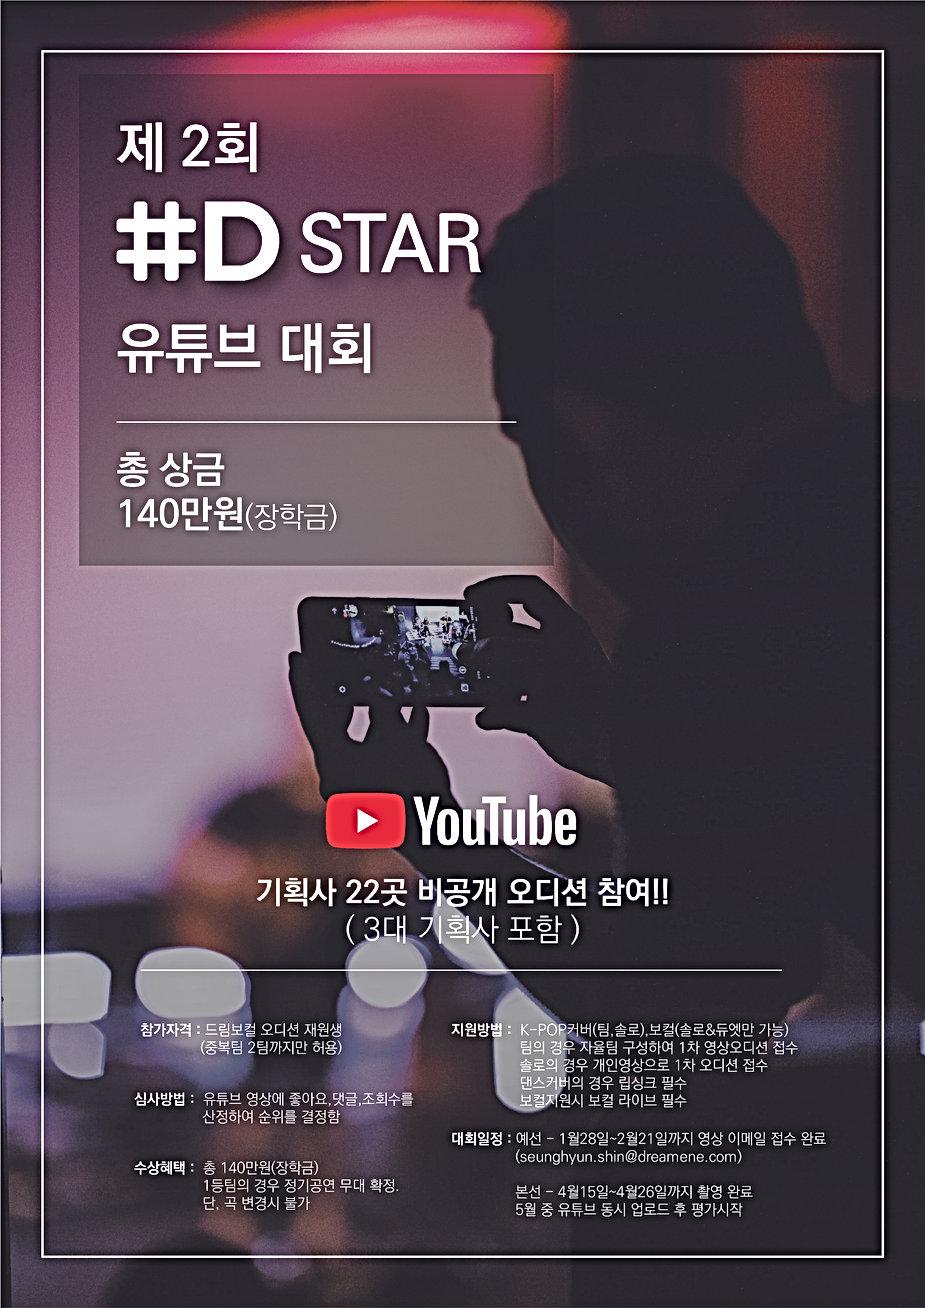 190905 #D 스타 유튜브 대회 포스터a4-05.jpg